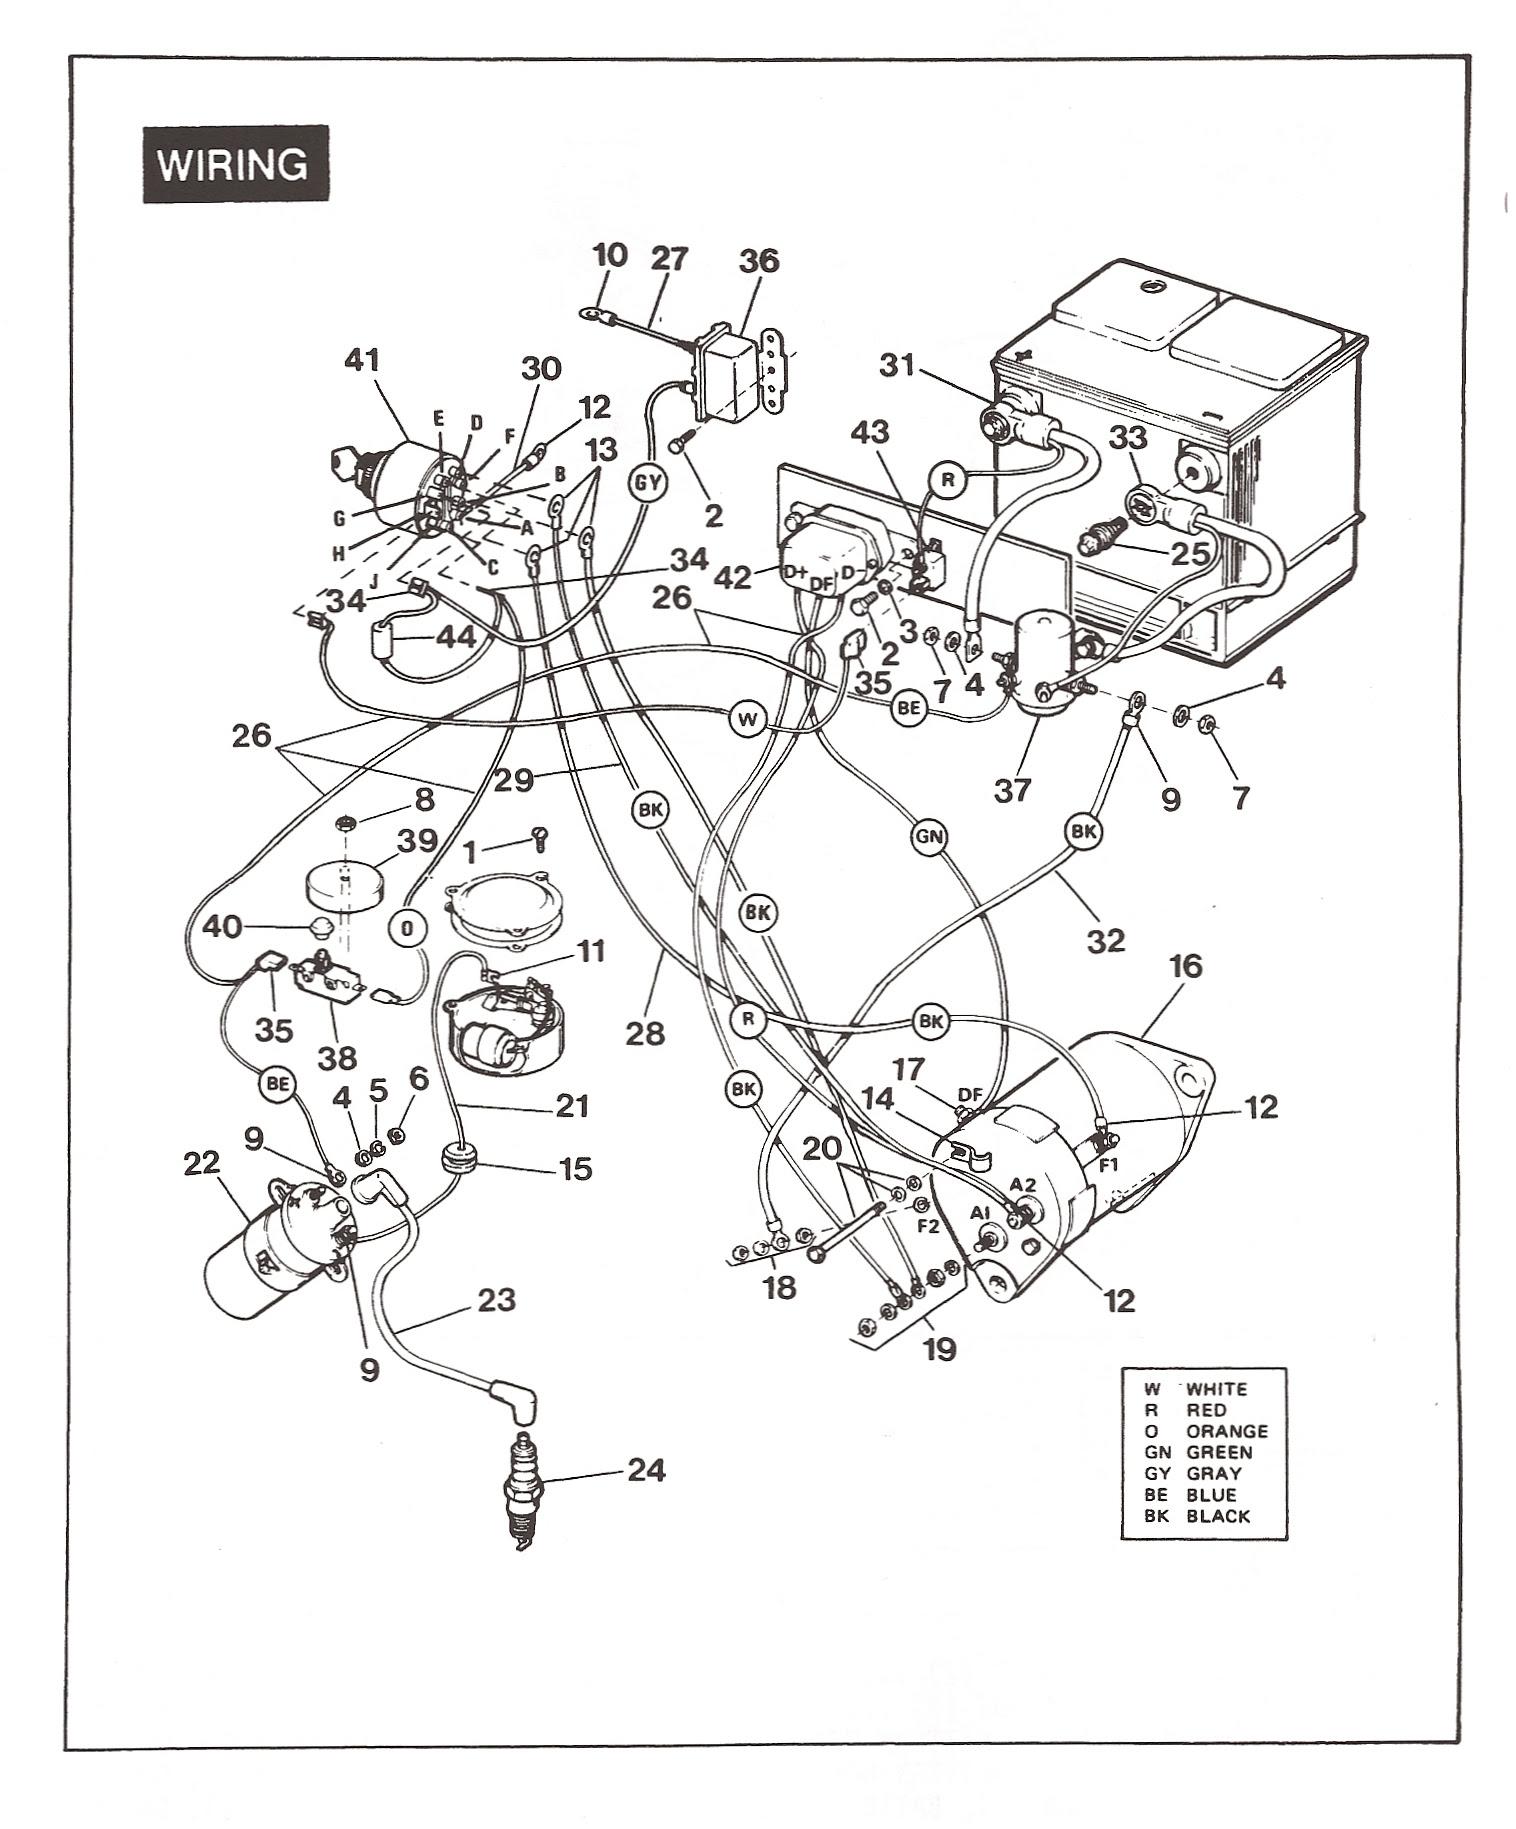 volvo pv444 wiring diagram vintage car electrical binatanicom